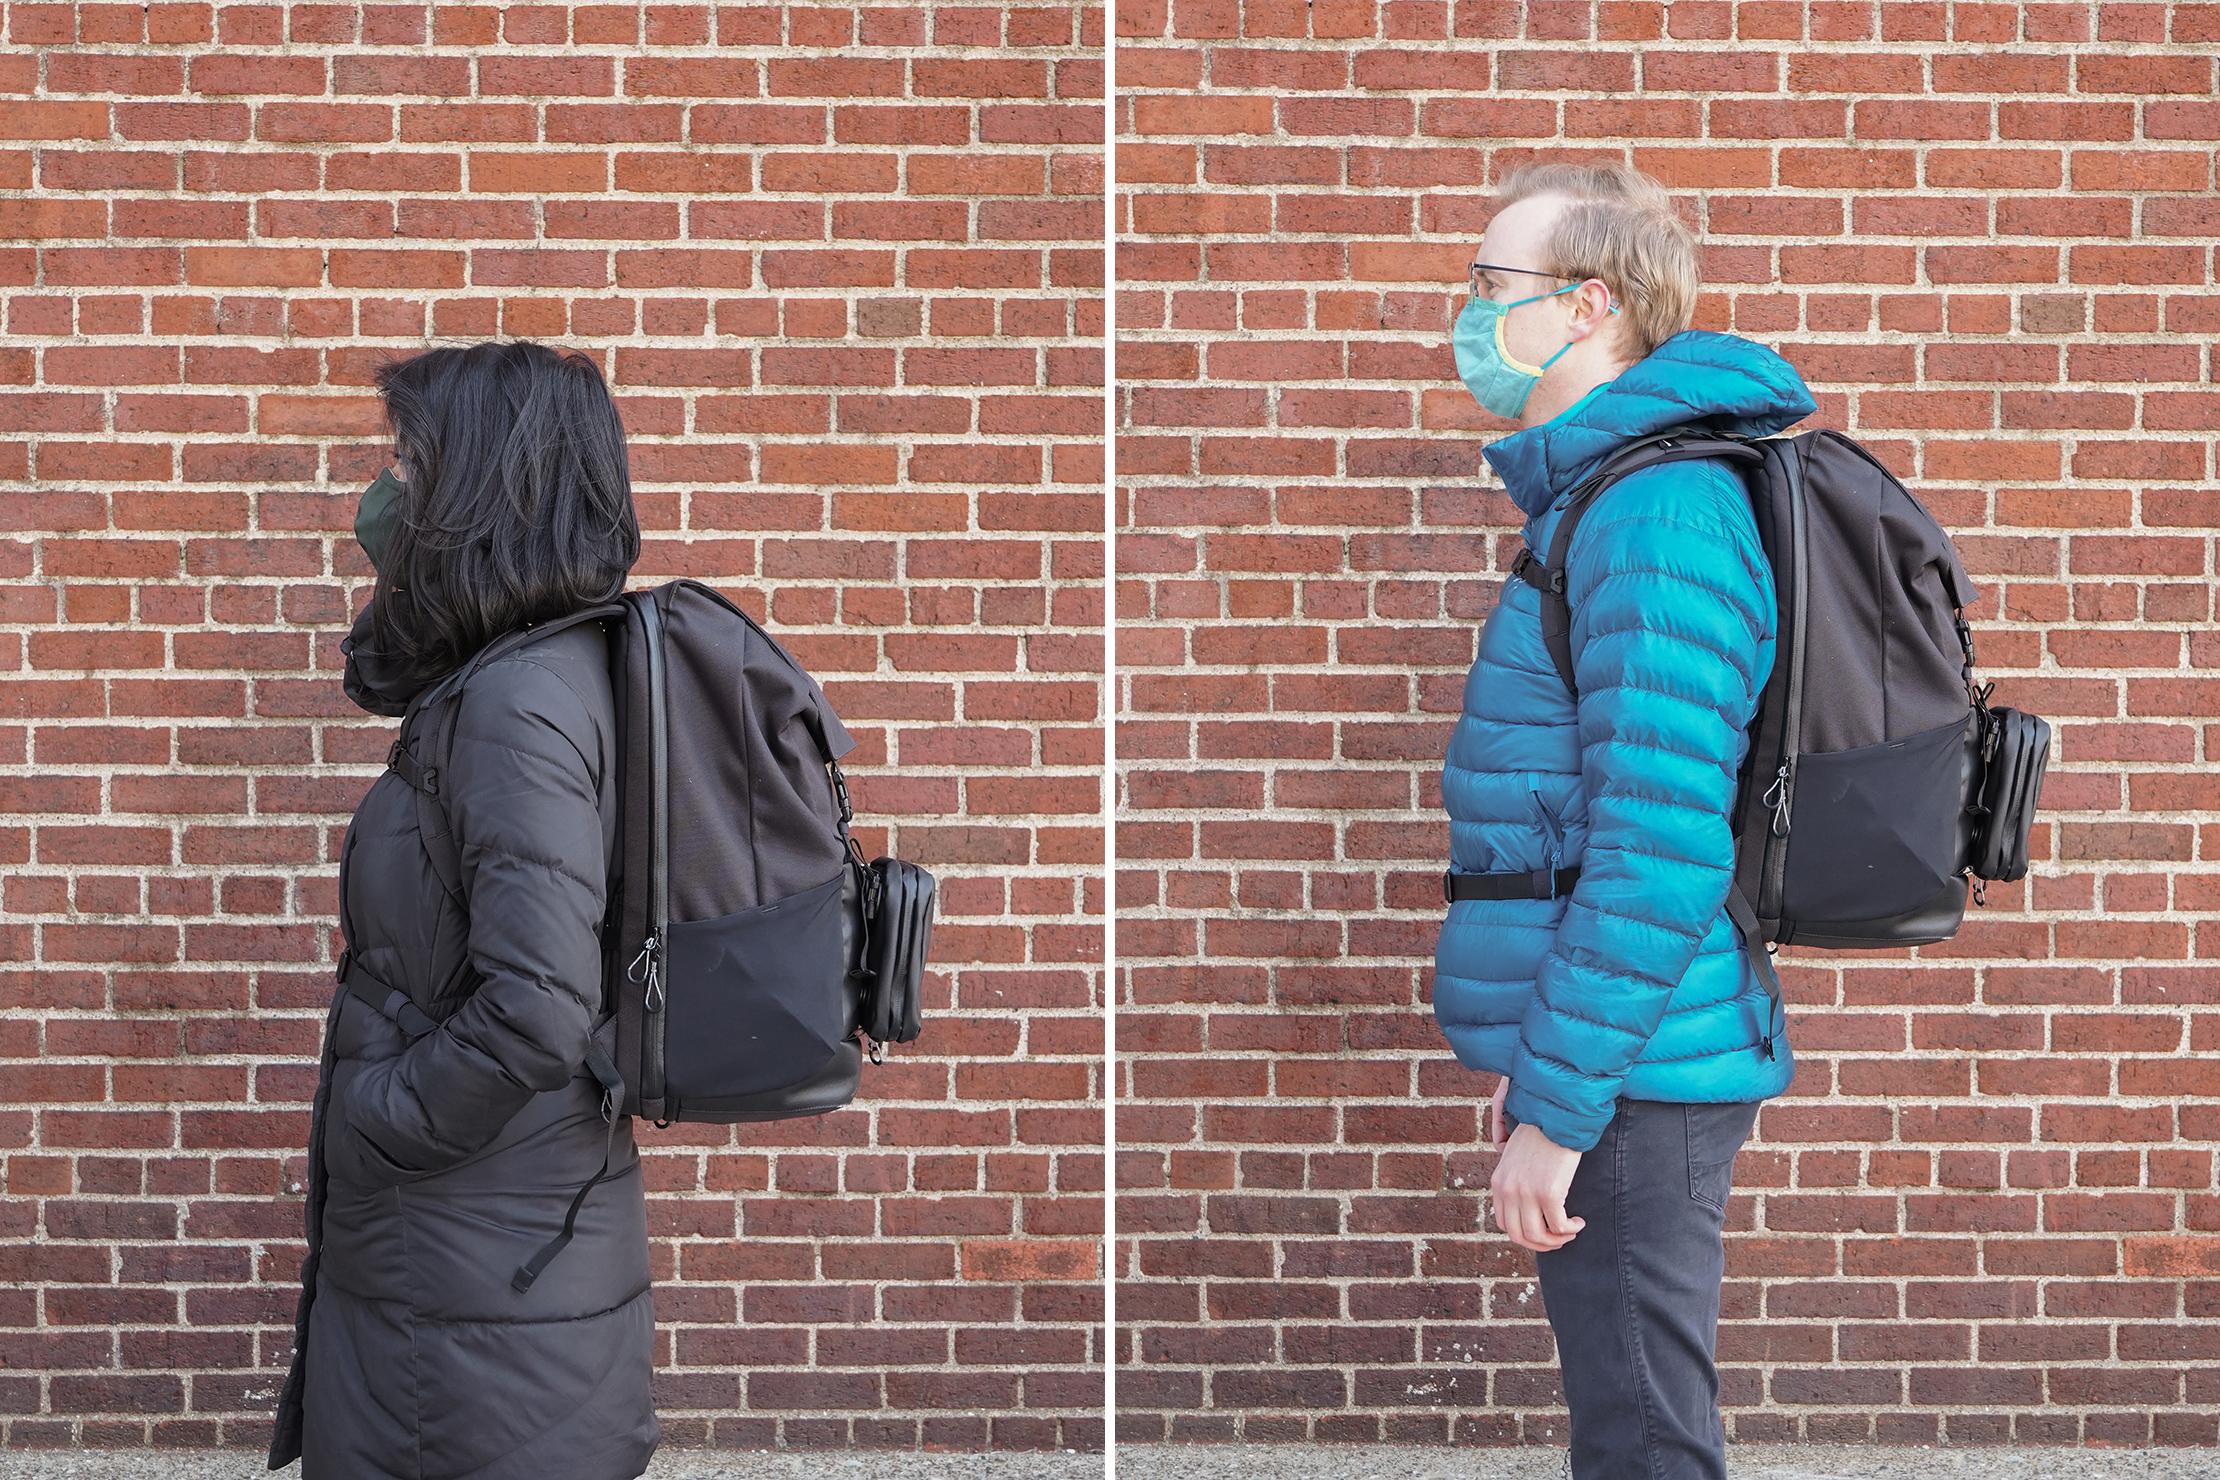 "Left: Lauren Hom, Height, 5'3"" (160 cm), Torso: 17"" (43 cm) | Right: Mark Hurrish, Height, 5'10"" (178 cm), Torso: 19"" (48 cm)"